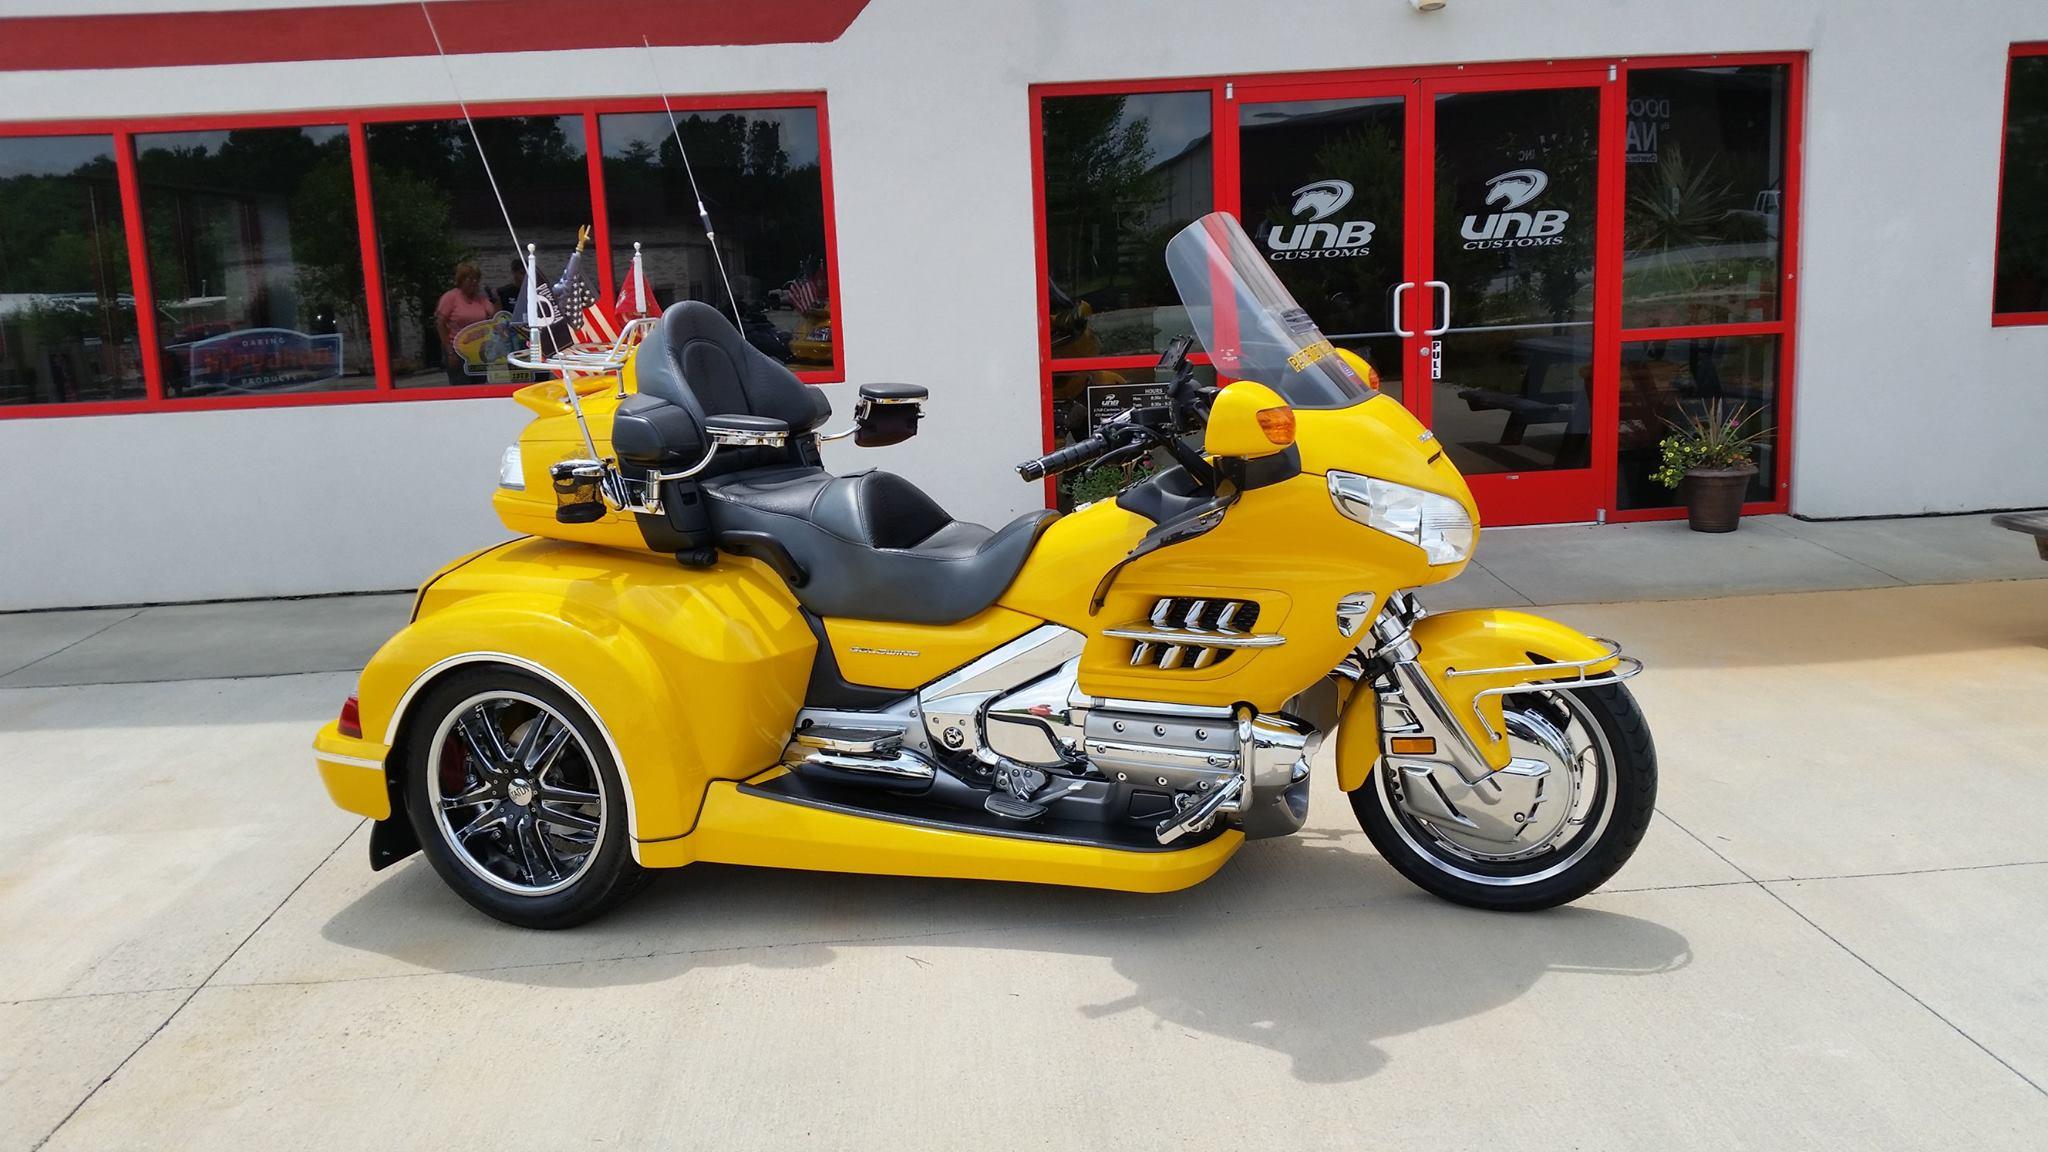 Honda Goldwing 1800 Roadsmith trike kit conversion (yellow)